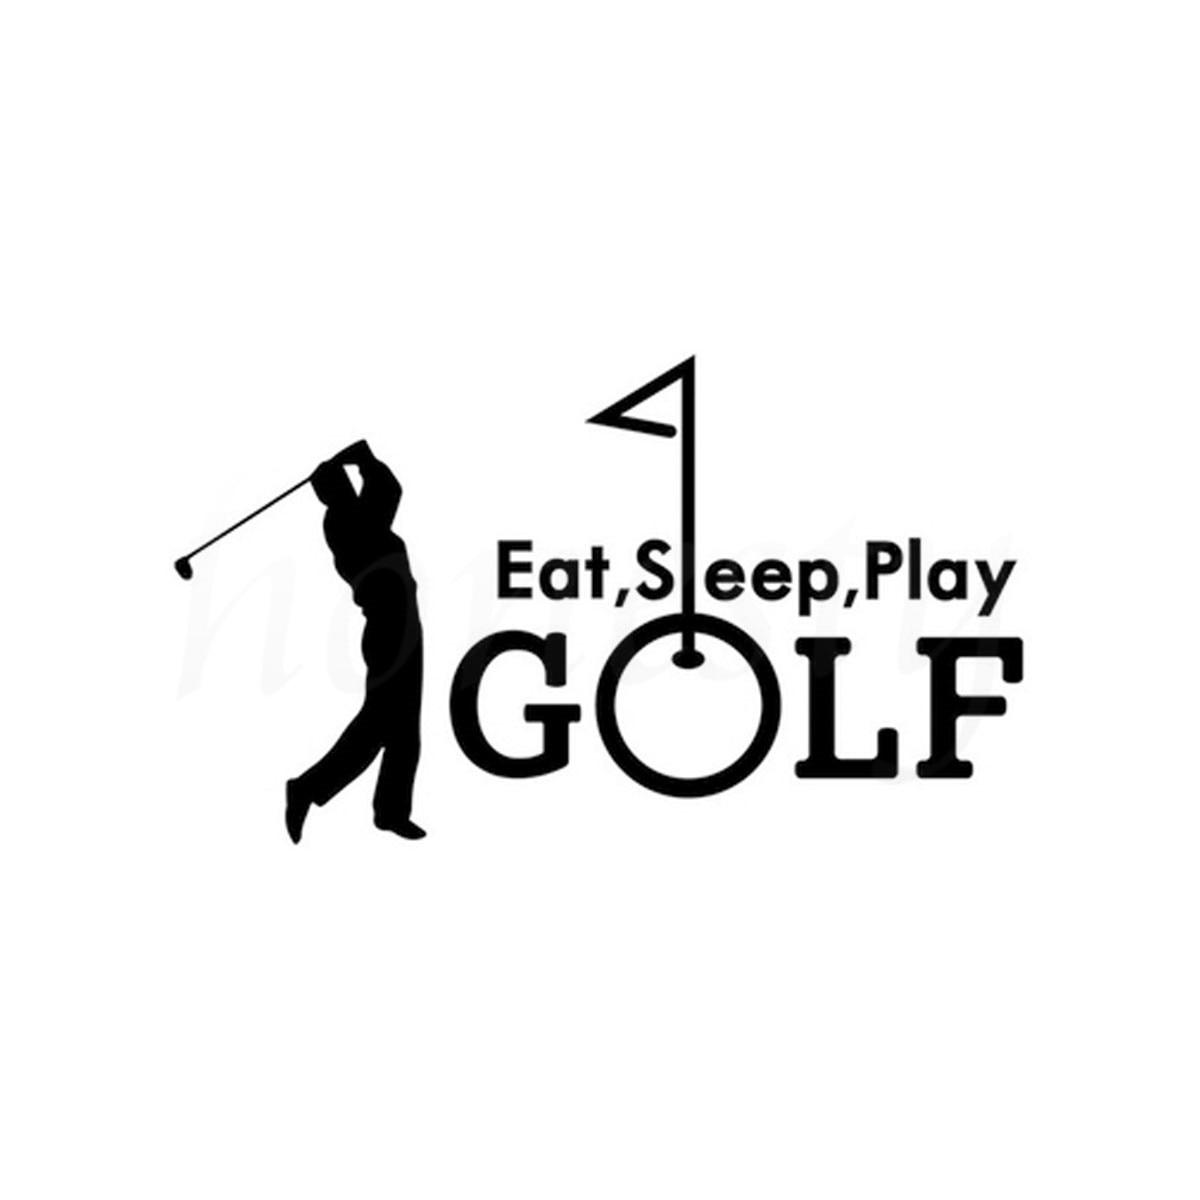 Golfing Sports Car Sticker Eat Sleep Play Art Wall Home Glass Window Laptop Truck Bumper Vinyl Decal Decor Black 18.0cmX10.4cm